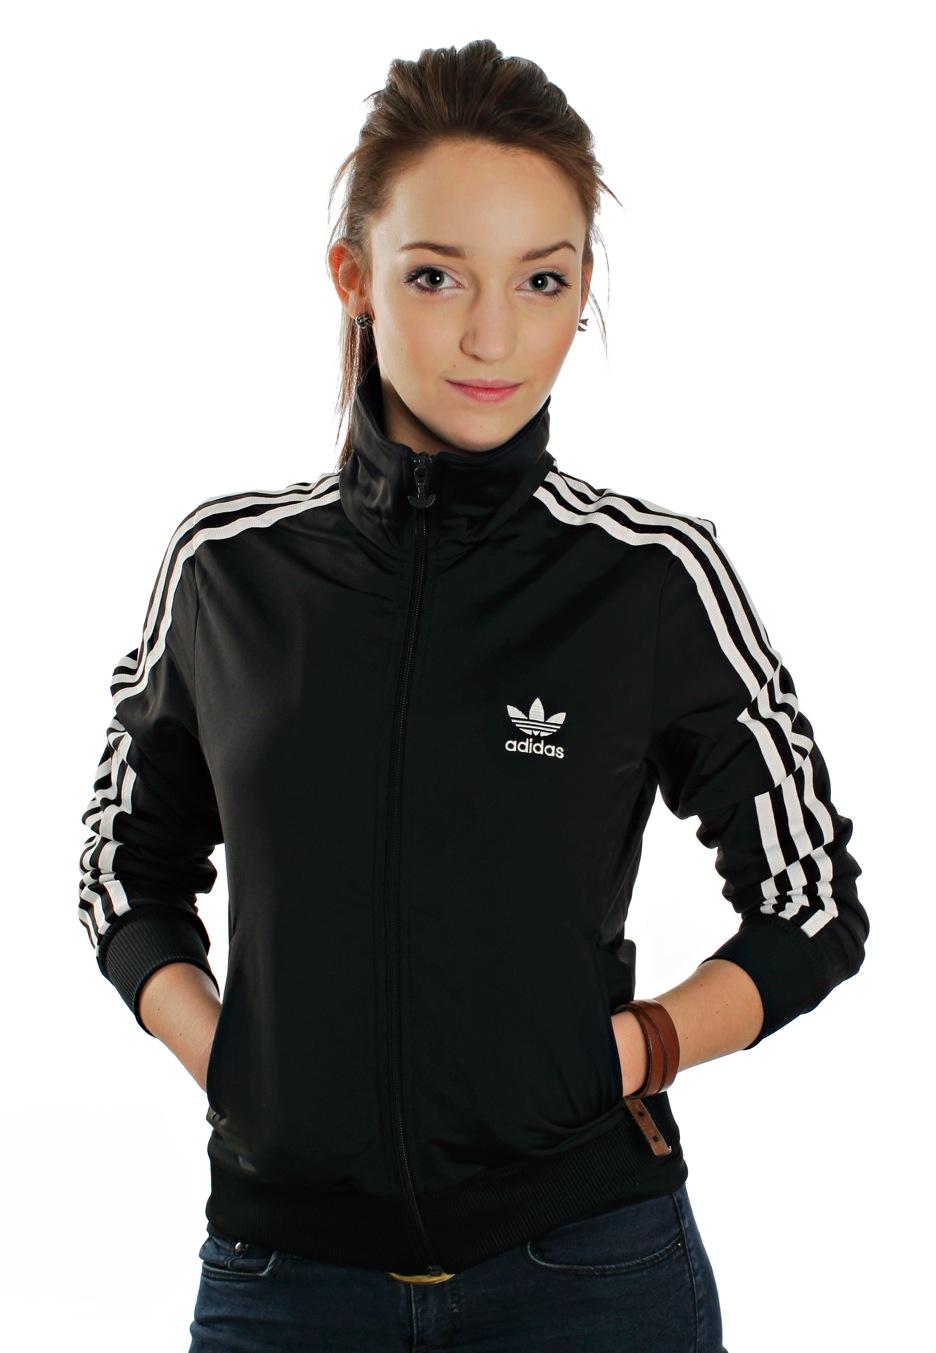 adidas firebird black white track jacket streetwear. Black Bedroom Furniture Sets. Home Design Ideas